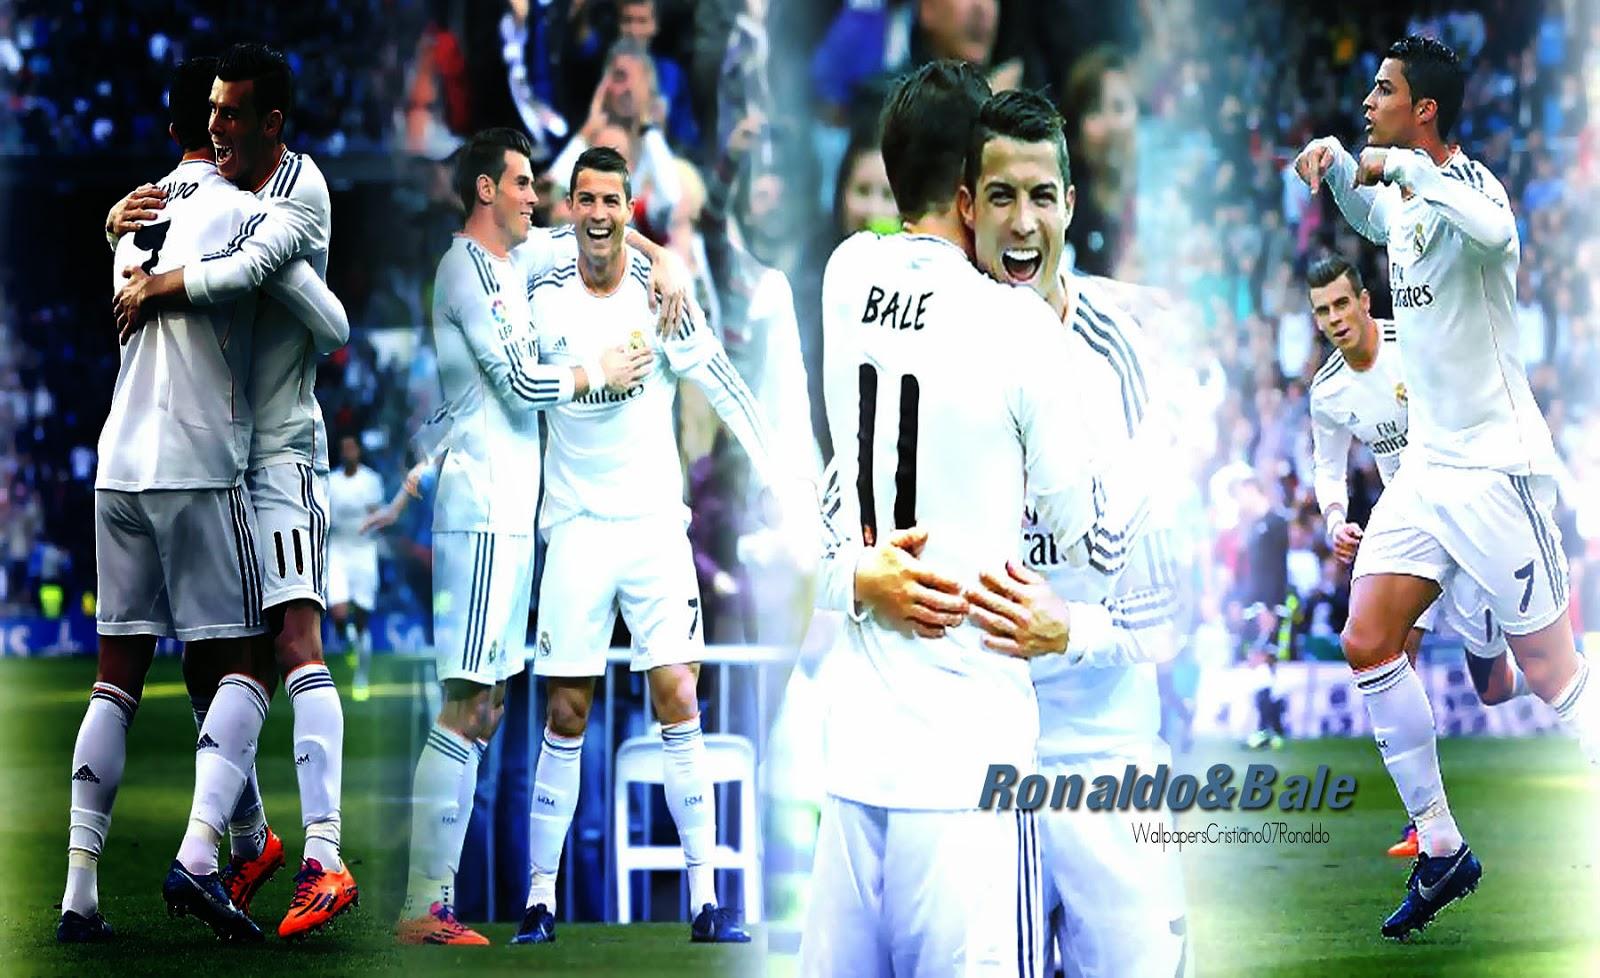 Cristiano Ronaldo Gareth Bale Wallpaper HD Real Madrid